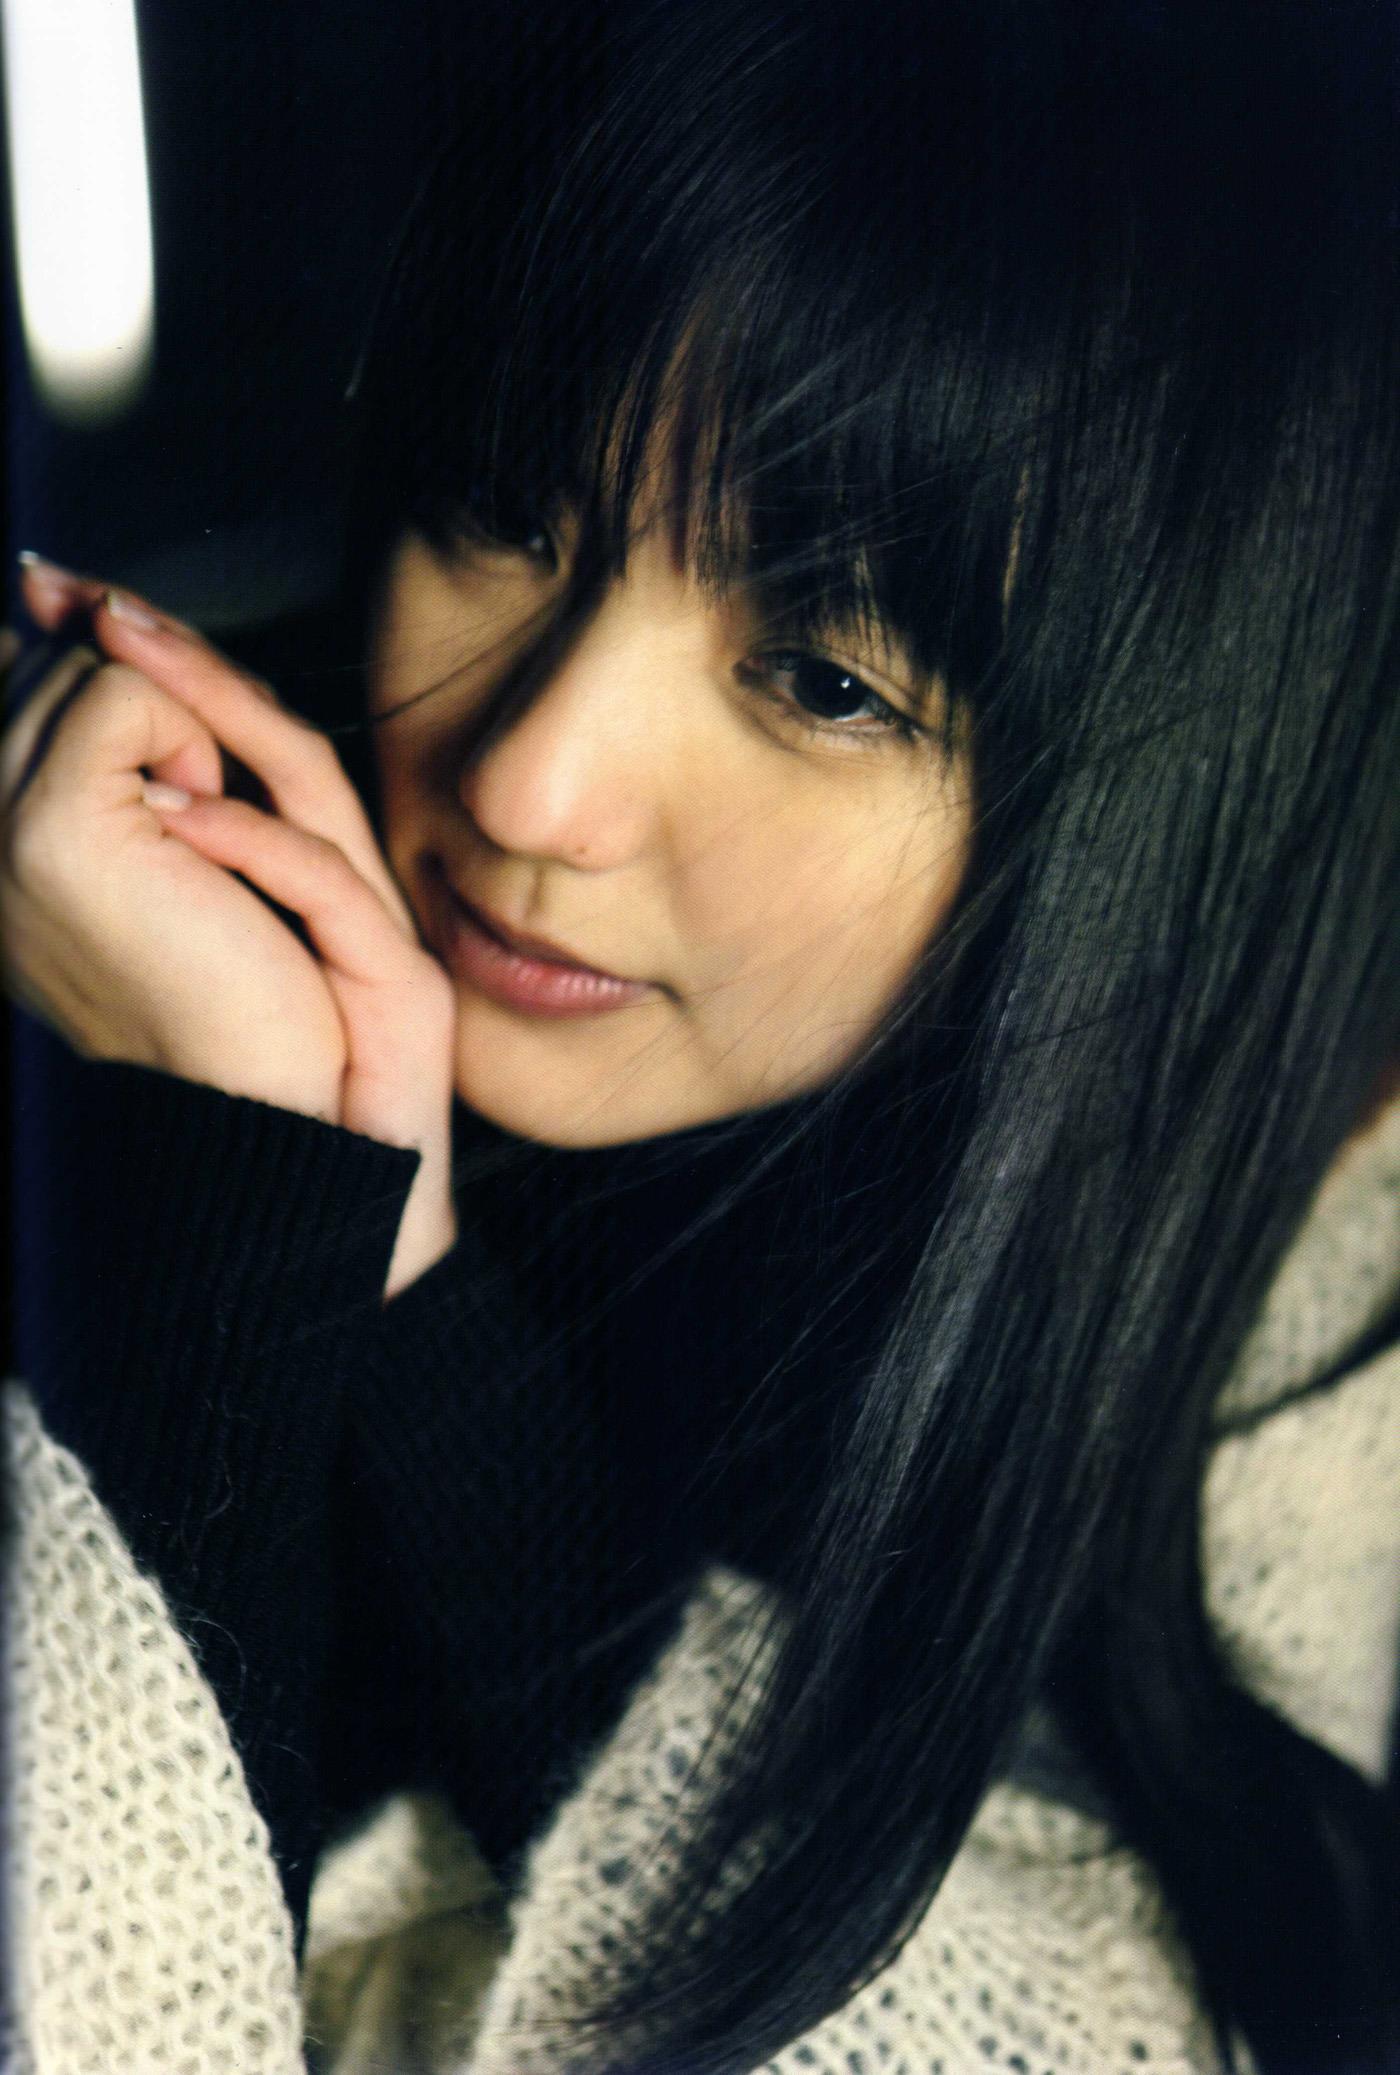 真野恵里菜 エロ画像 155